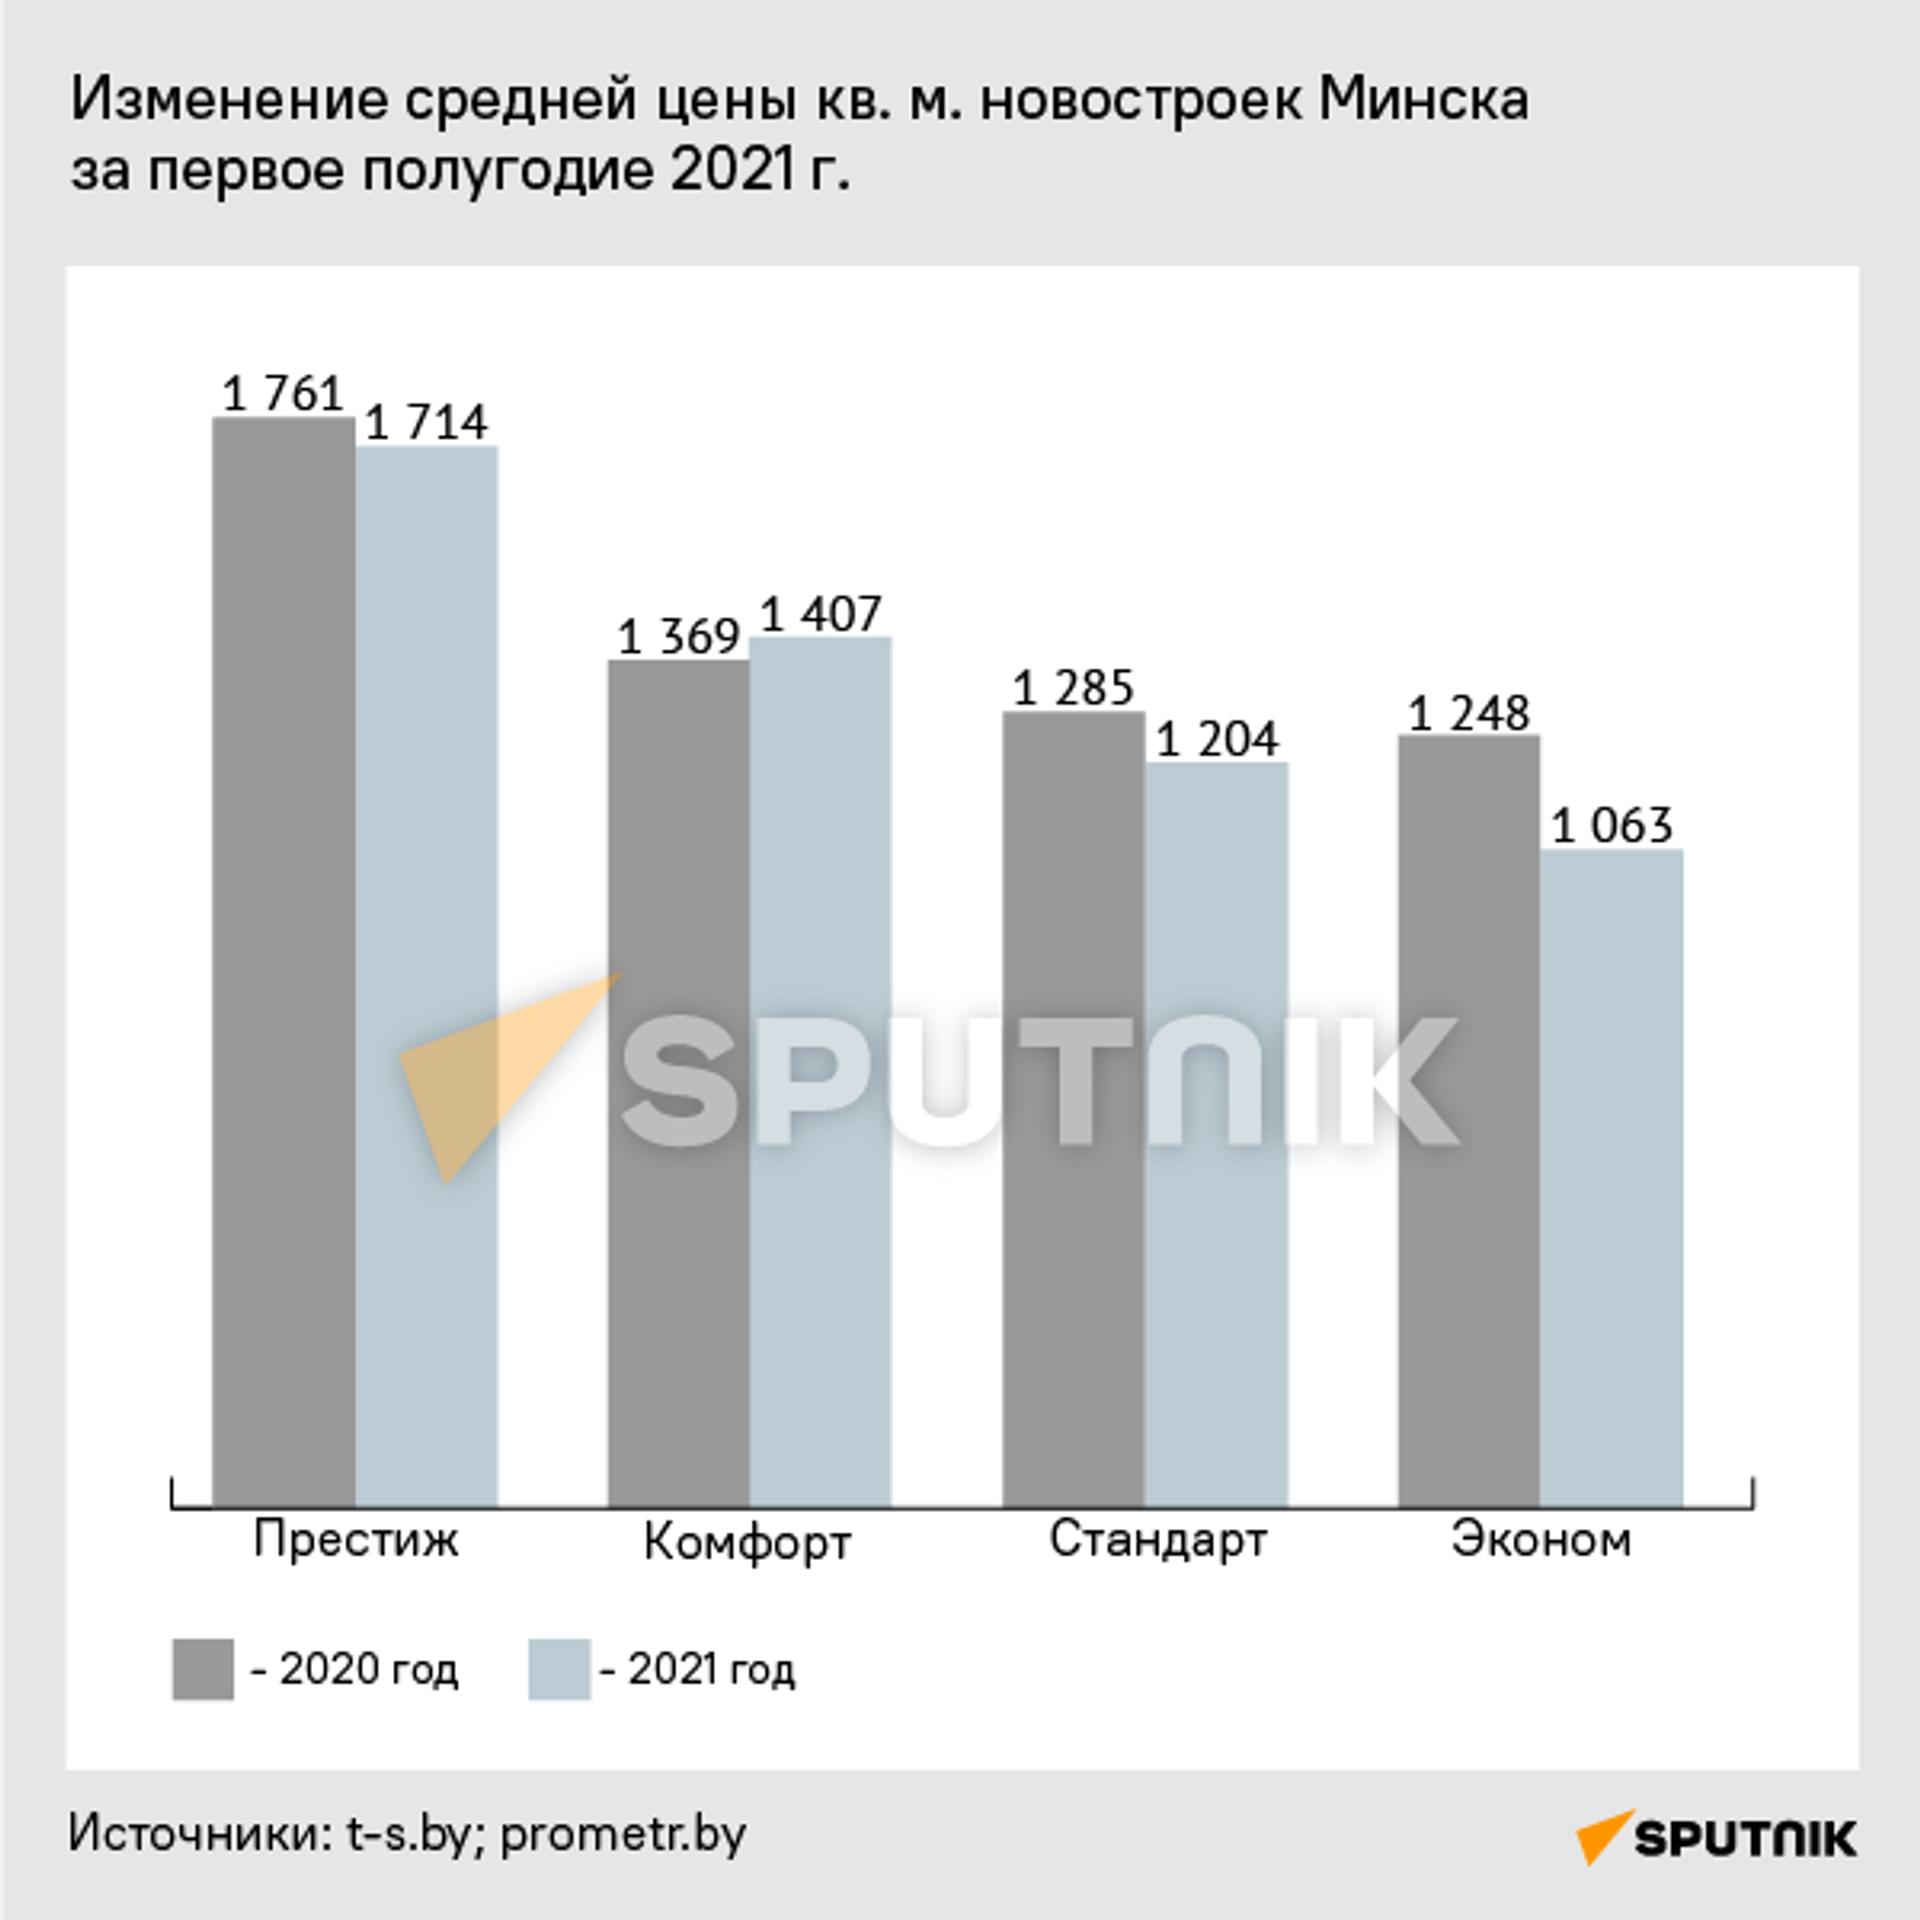 Динамика изменения цен на квартиры в новостройках - Sputnik Беларусь, 1920, 04.08.2021